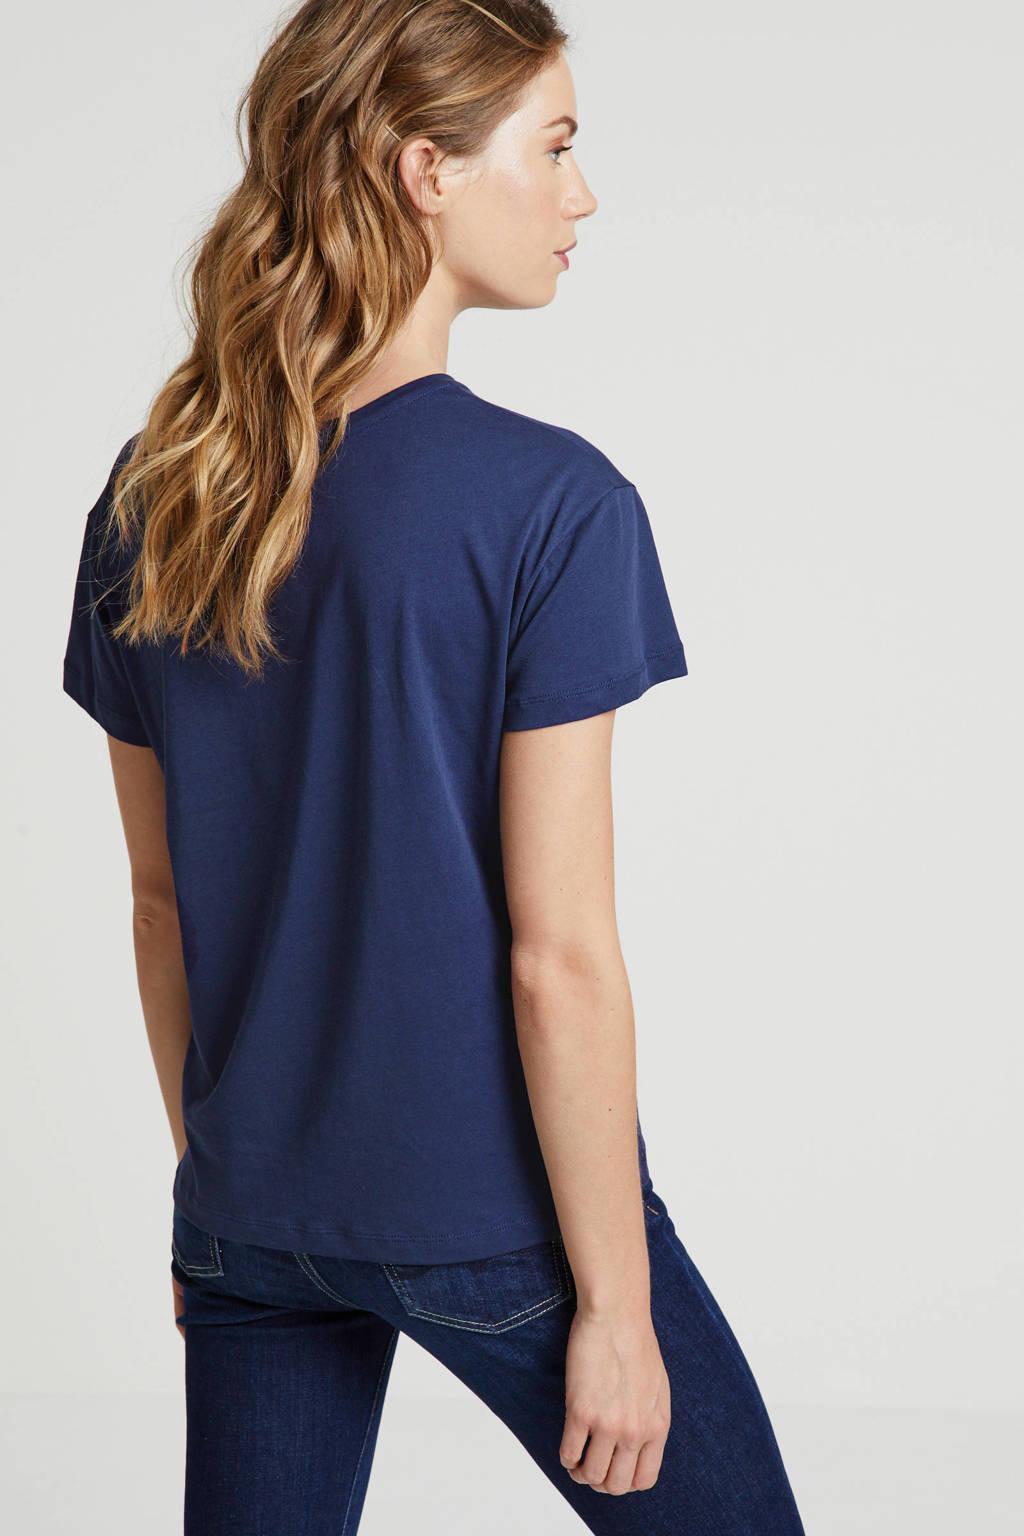 ARMEDANGELS T-shirt met printopdruk donkerblauw multi, Donkerblauw multi